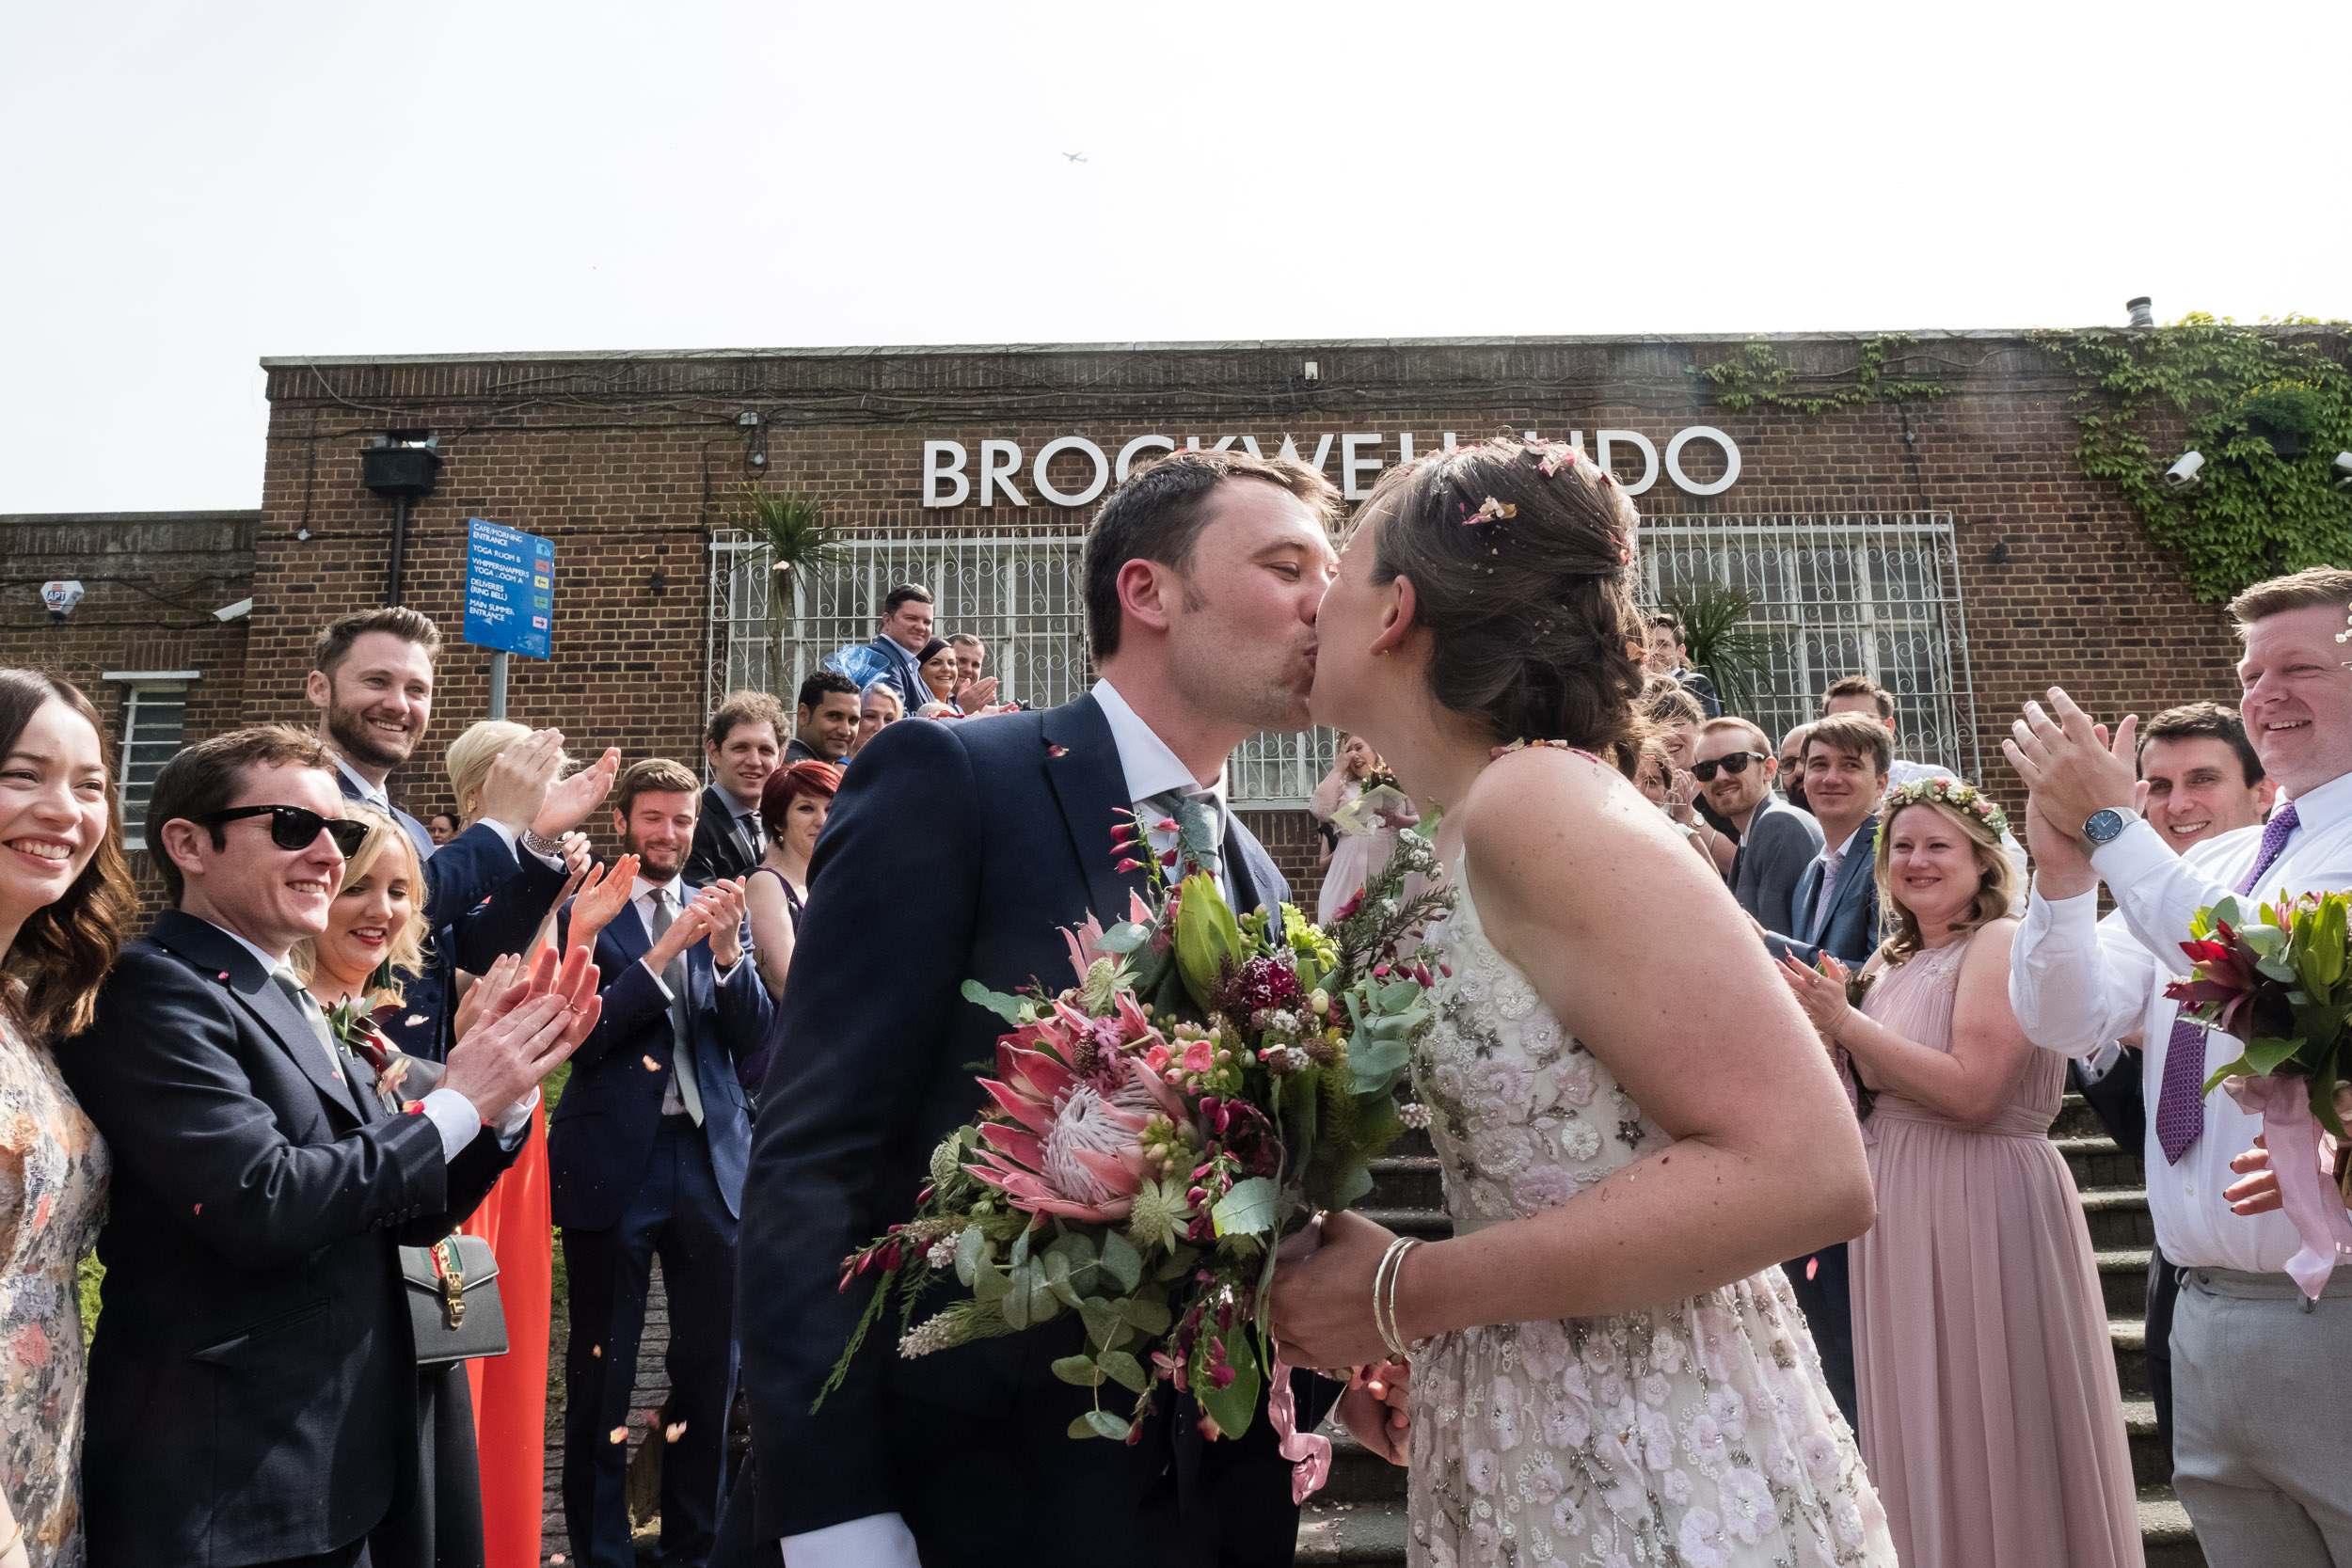 brockwell-lido-brixton-herne-hill-wedding-219.jpg